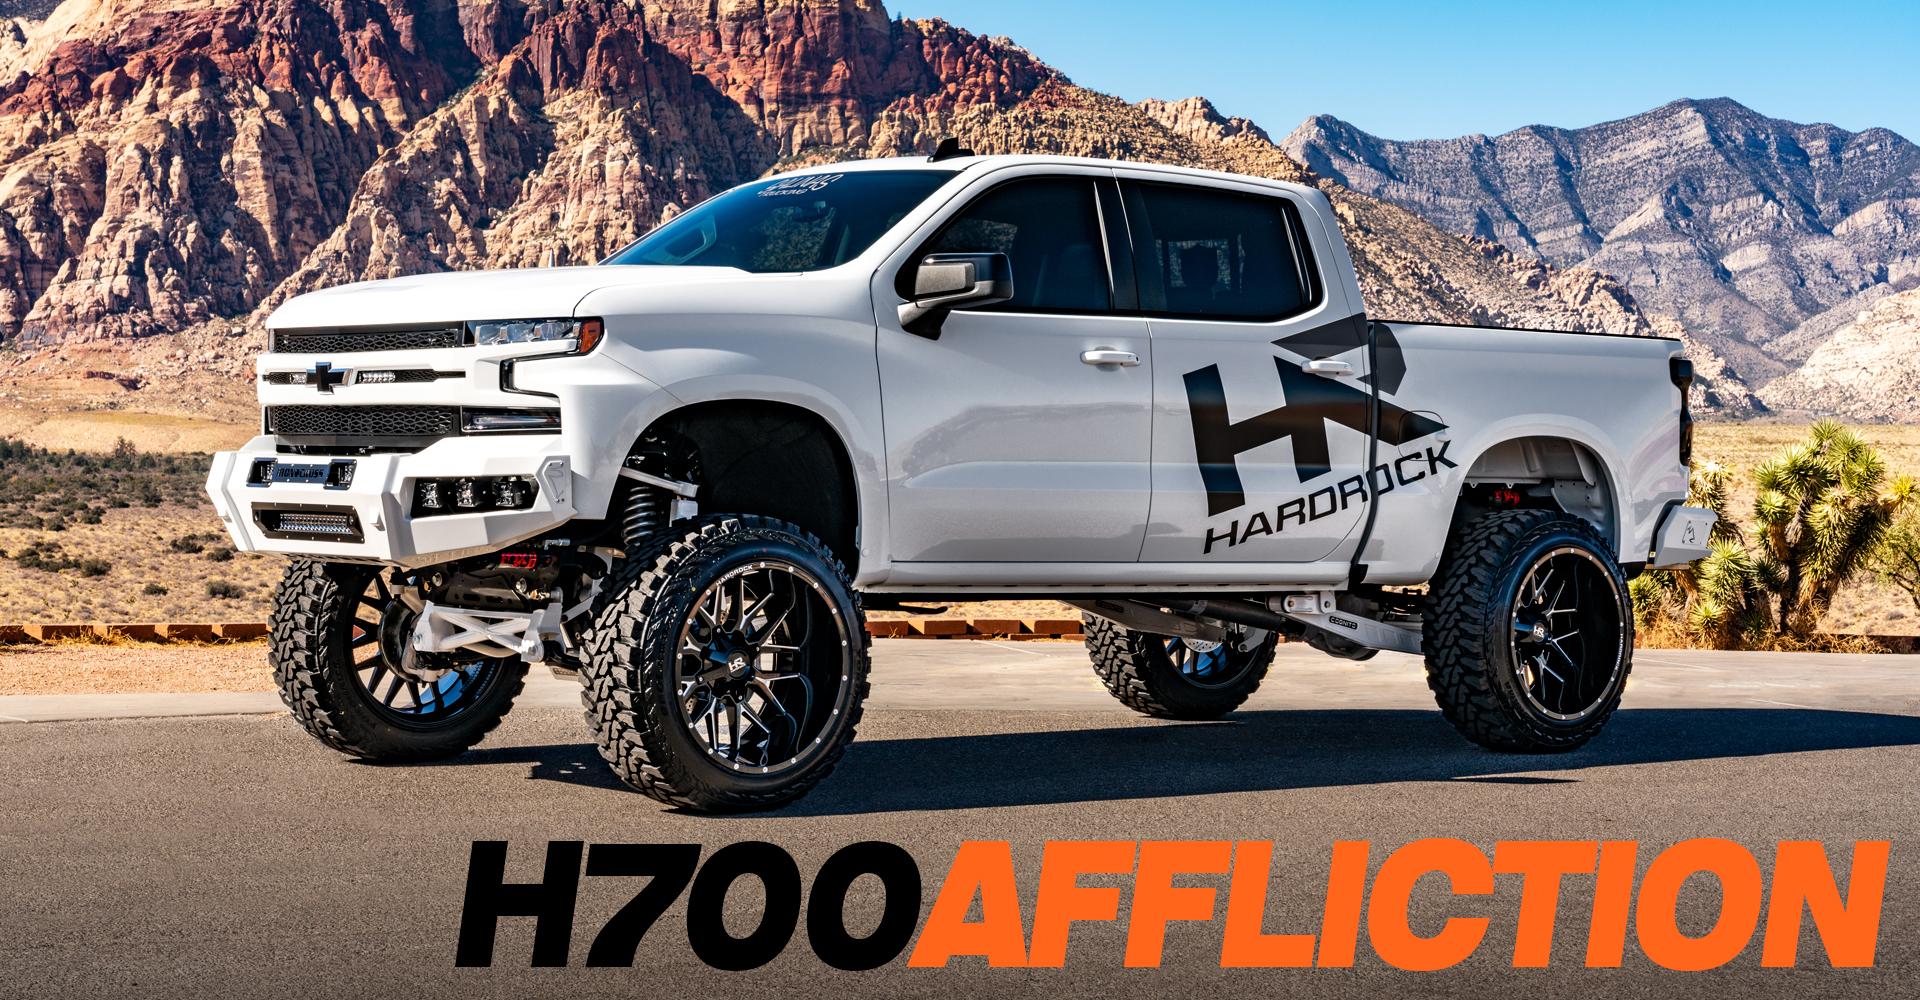 H700 Affliction 24x14 Hardrock Offroad Wheels Lifted Chevrolet Silverado SEMA 2019